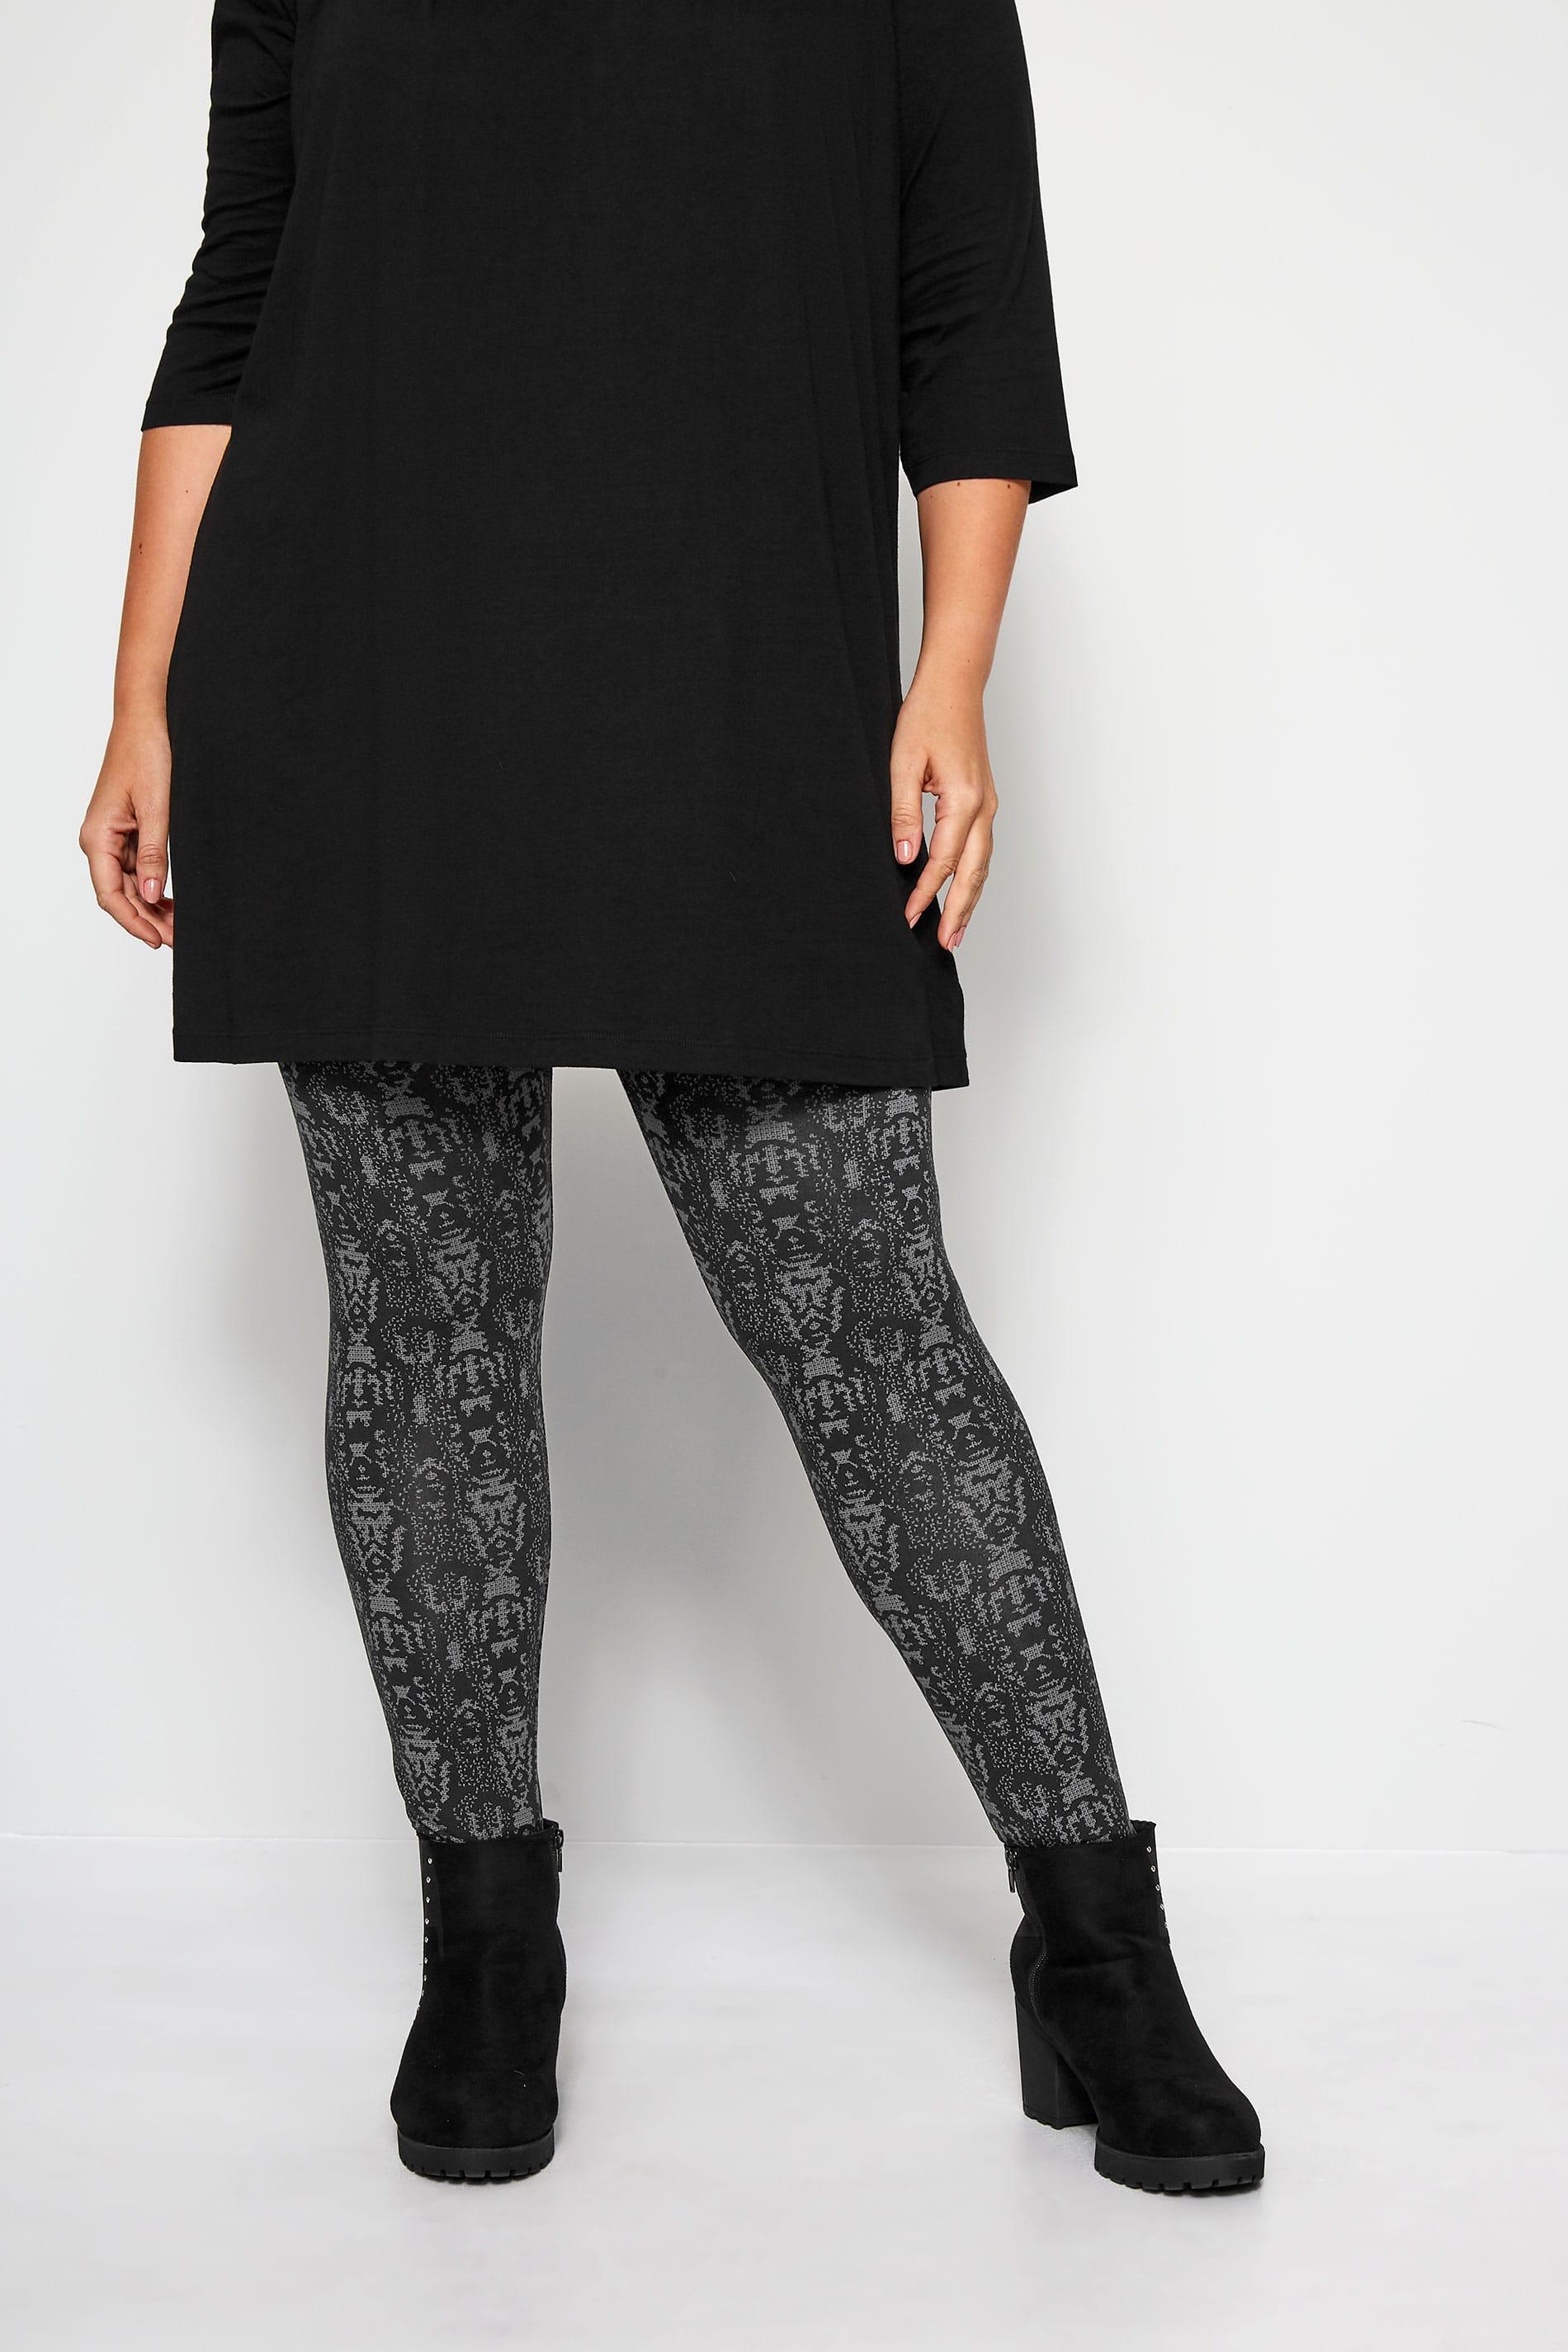 Black & Grey Snake Print Leggings